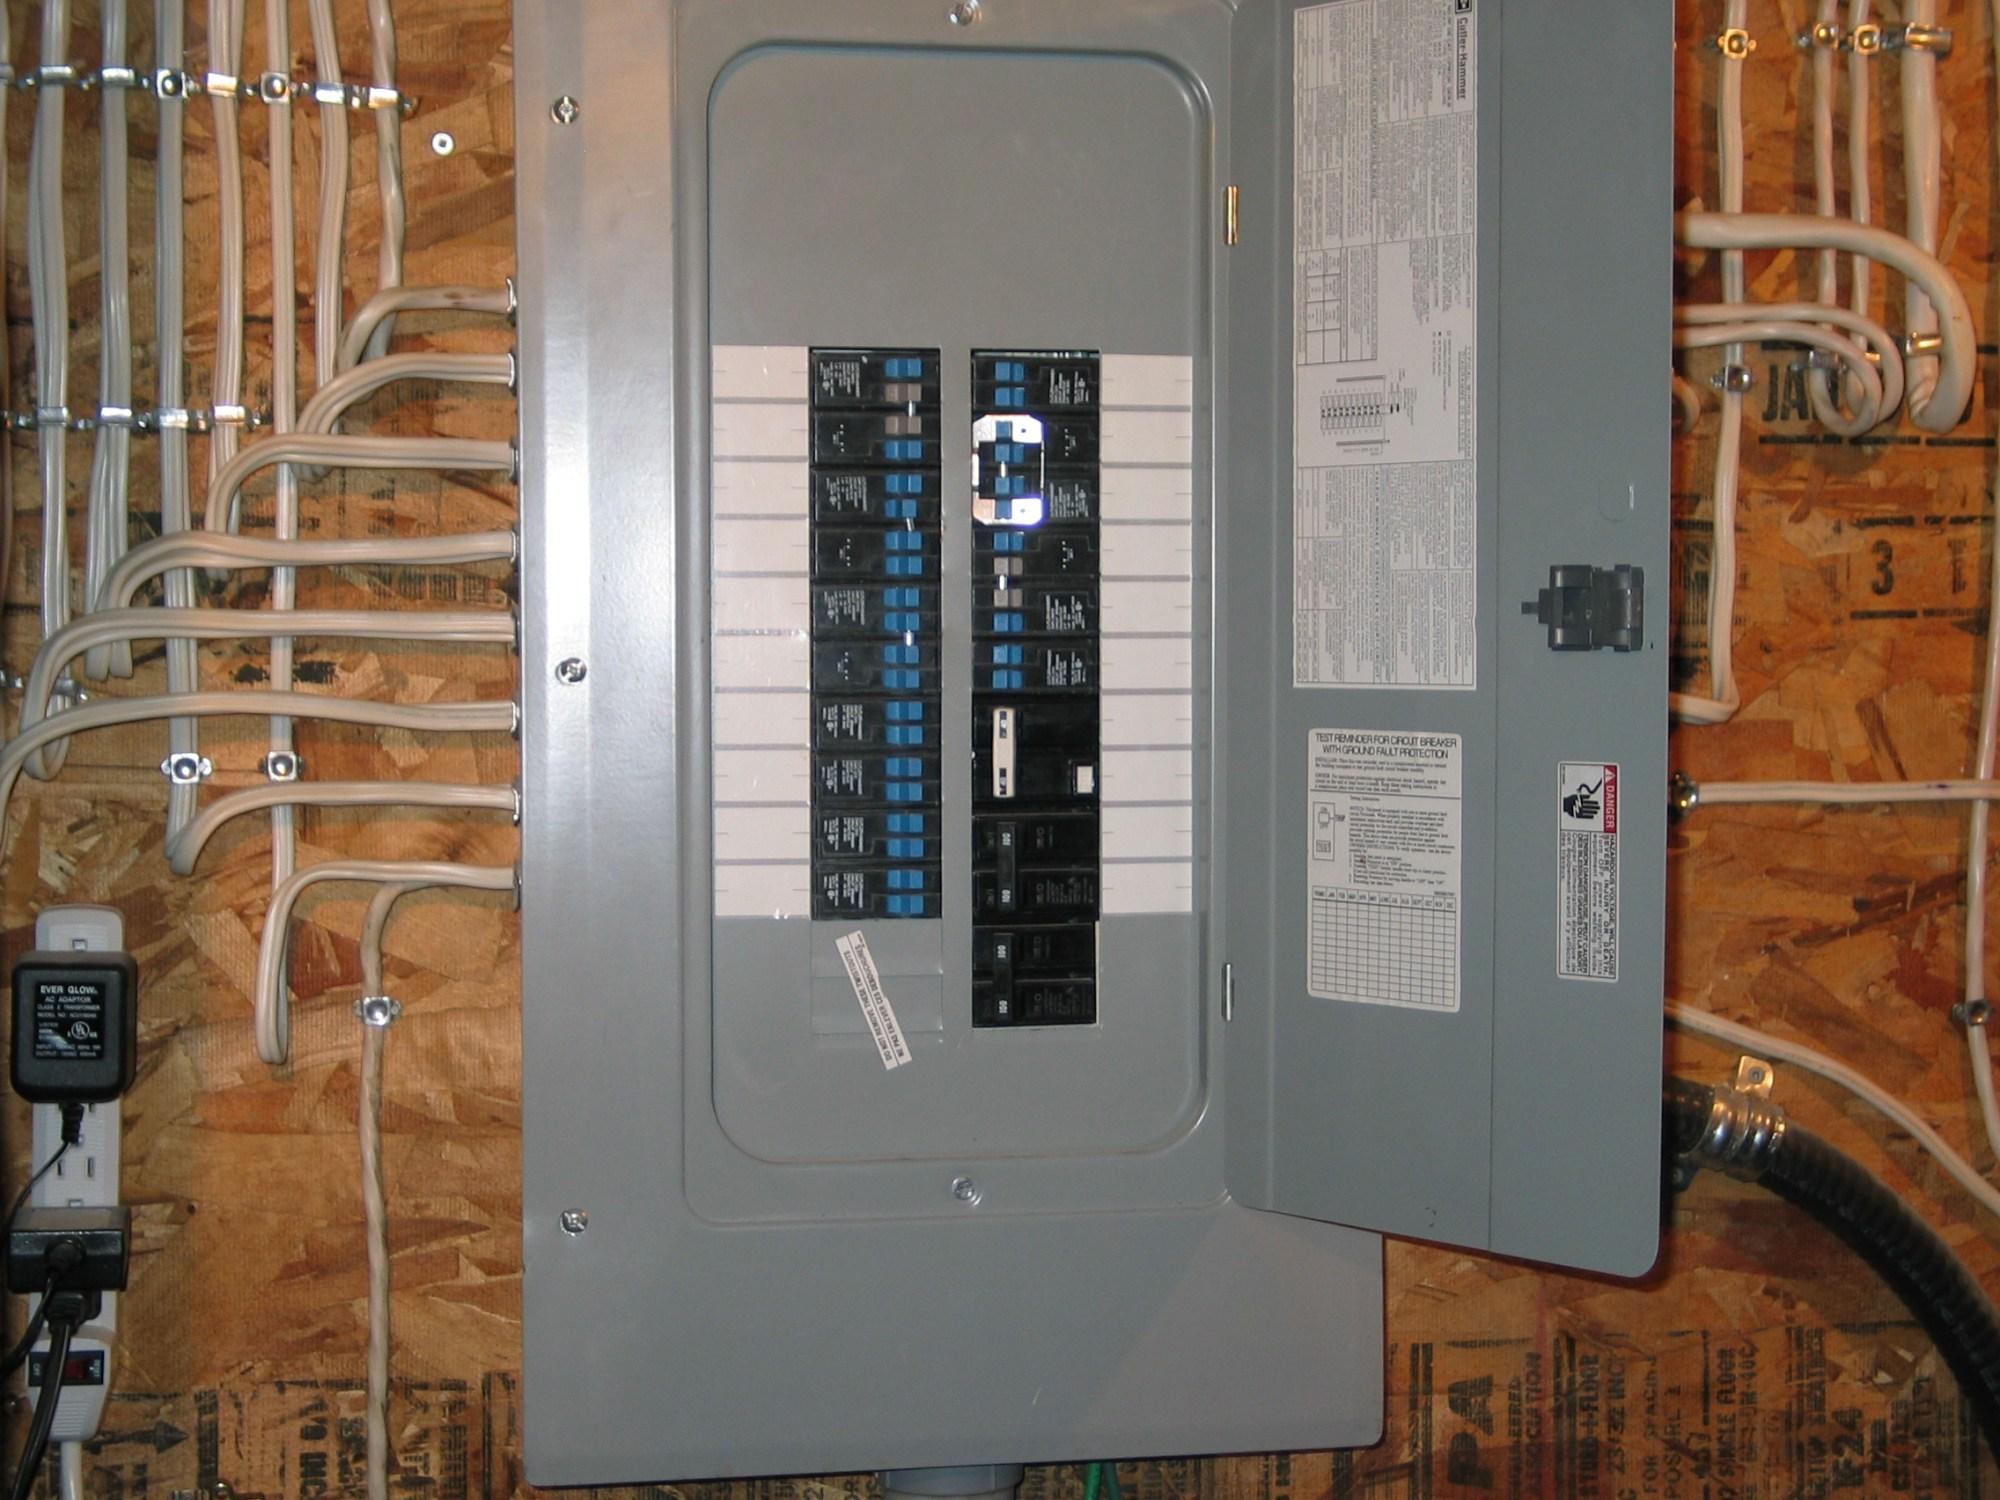 hight resolution of panel upgrades spring hill tn electrical contractor electrical contractor in spring hill tn 37174 southern electric of tn l l c